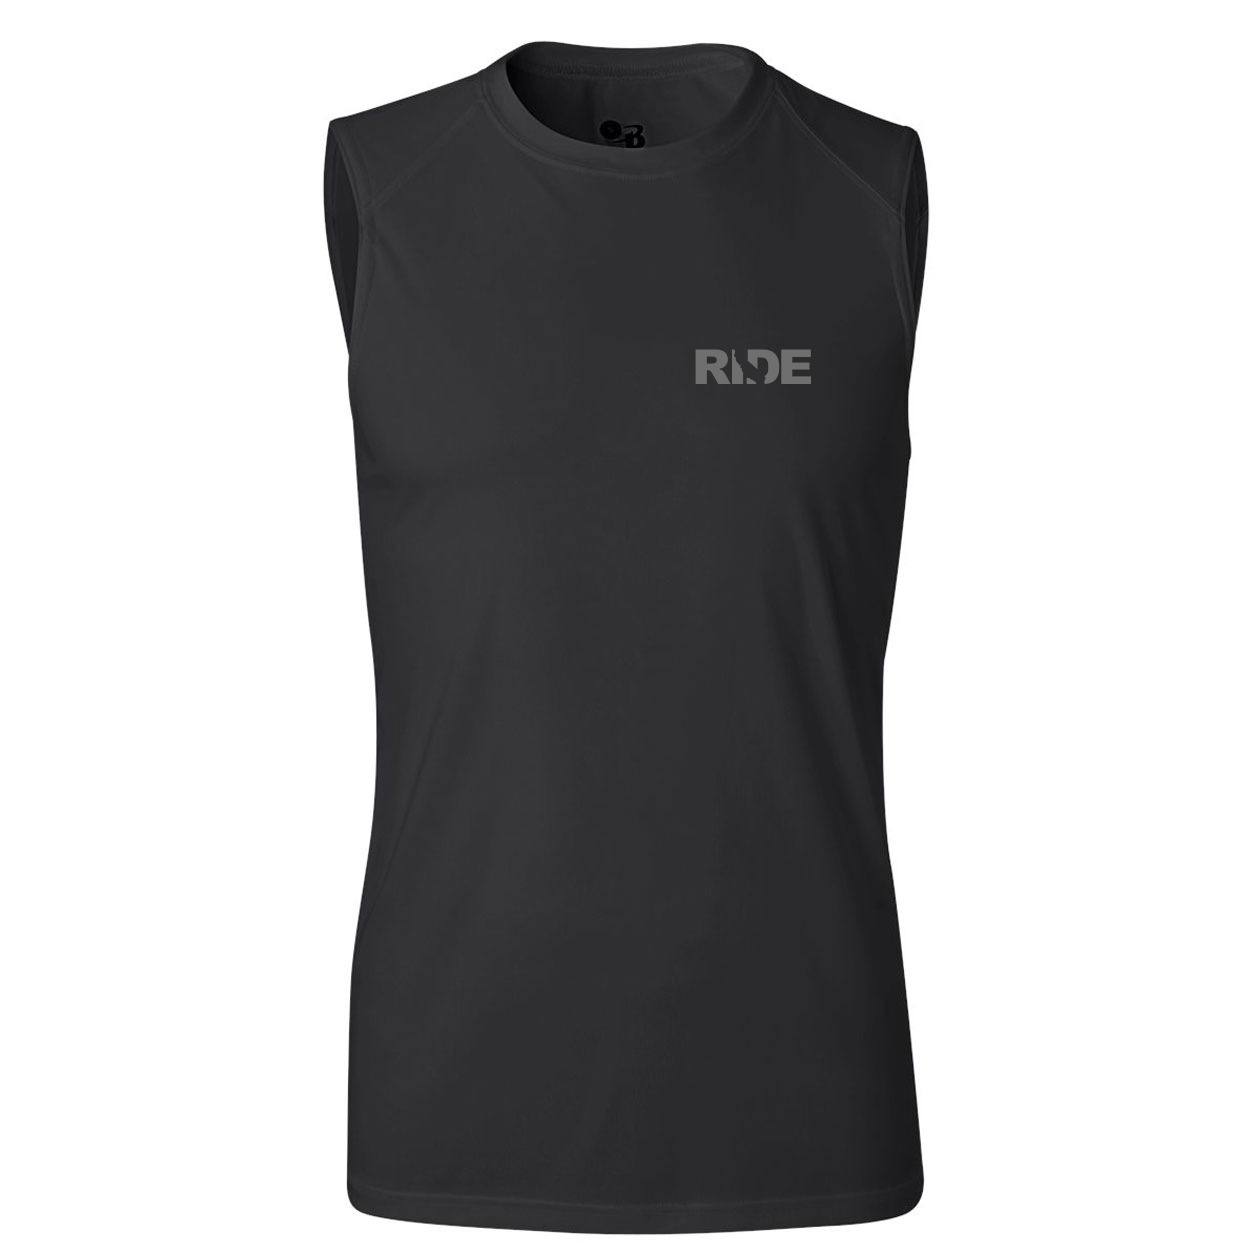 Ride California Night Out Unisex Performance Sleeveless T-Shirt Black (Gray Logo)